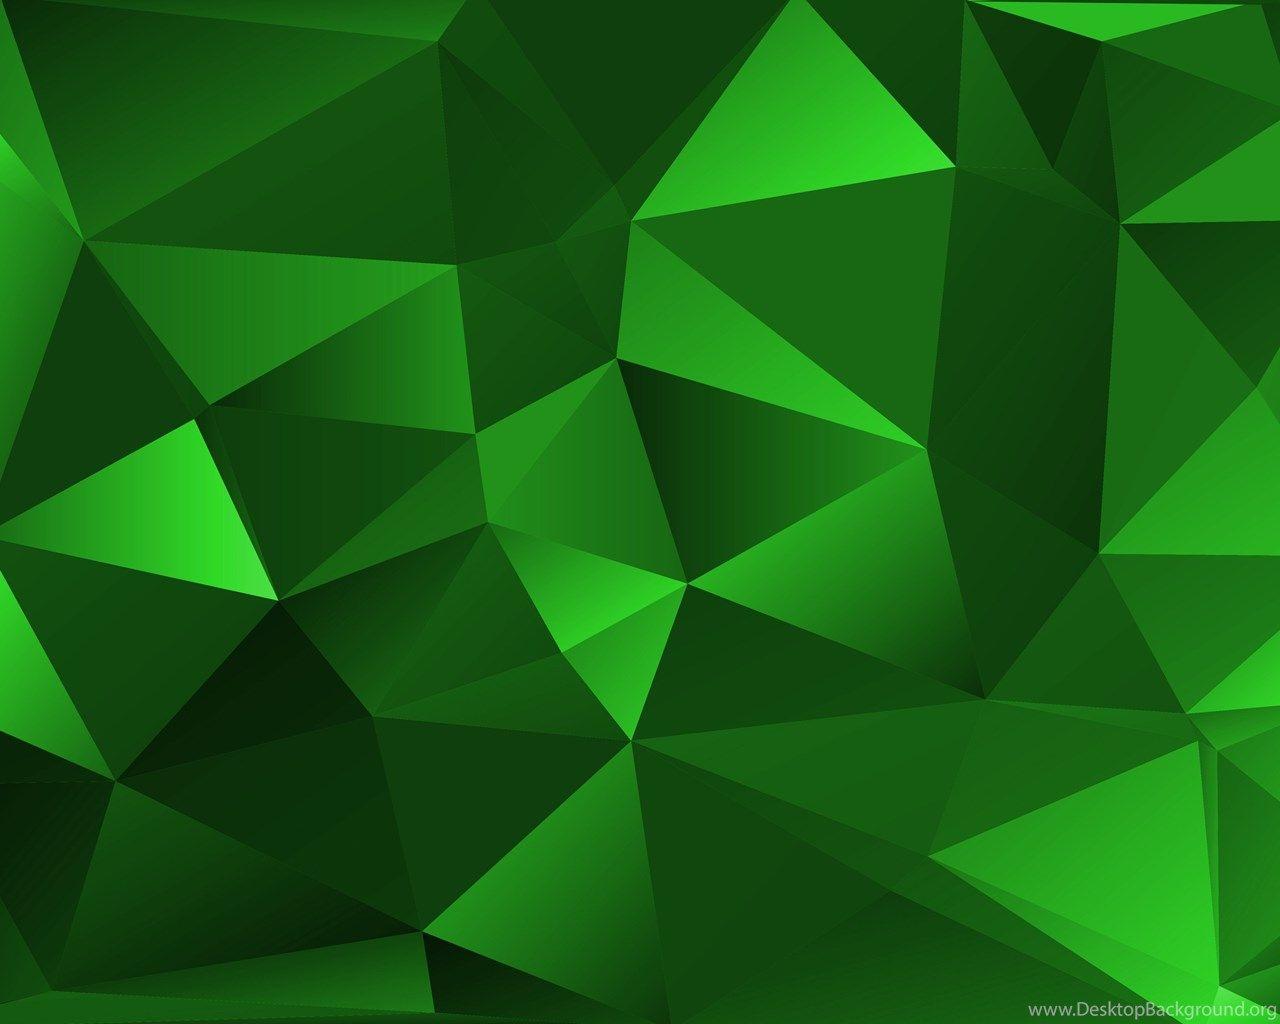 Image Result For Dark Green Polygon Background Vector Art Design